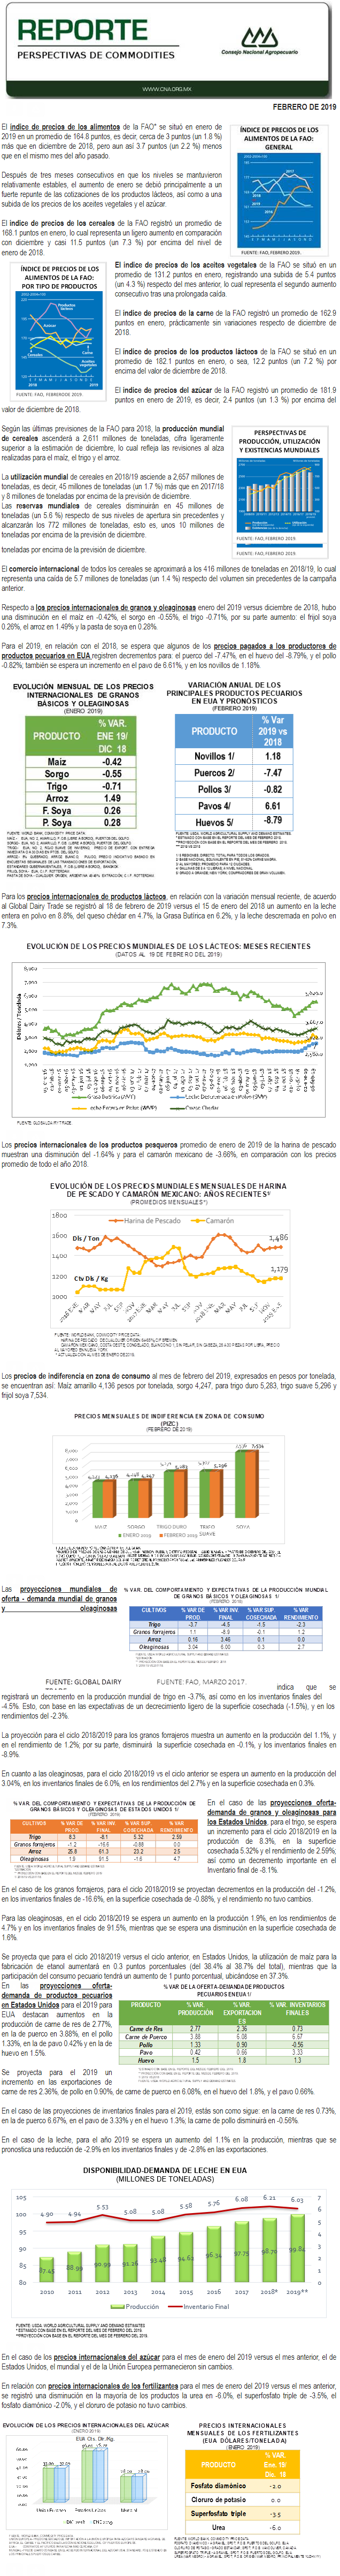 REPORTE DE PERSPECTIVAS DE COMMODITES DEL MES DE FEBRERO DEL 2019